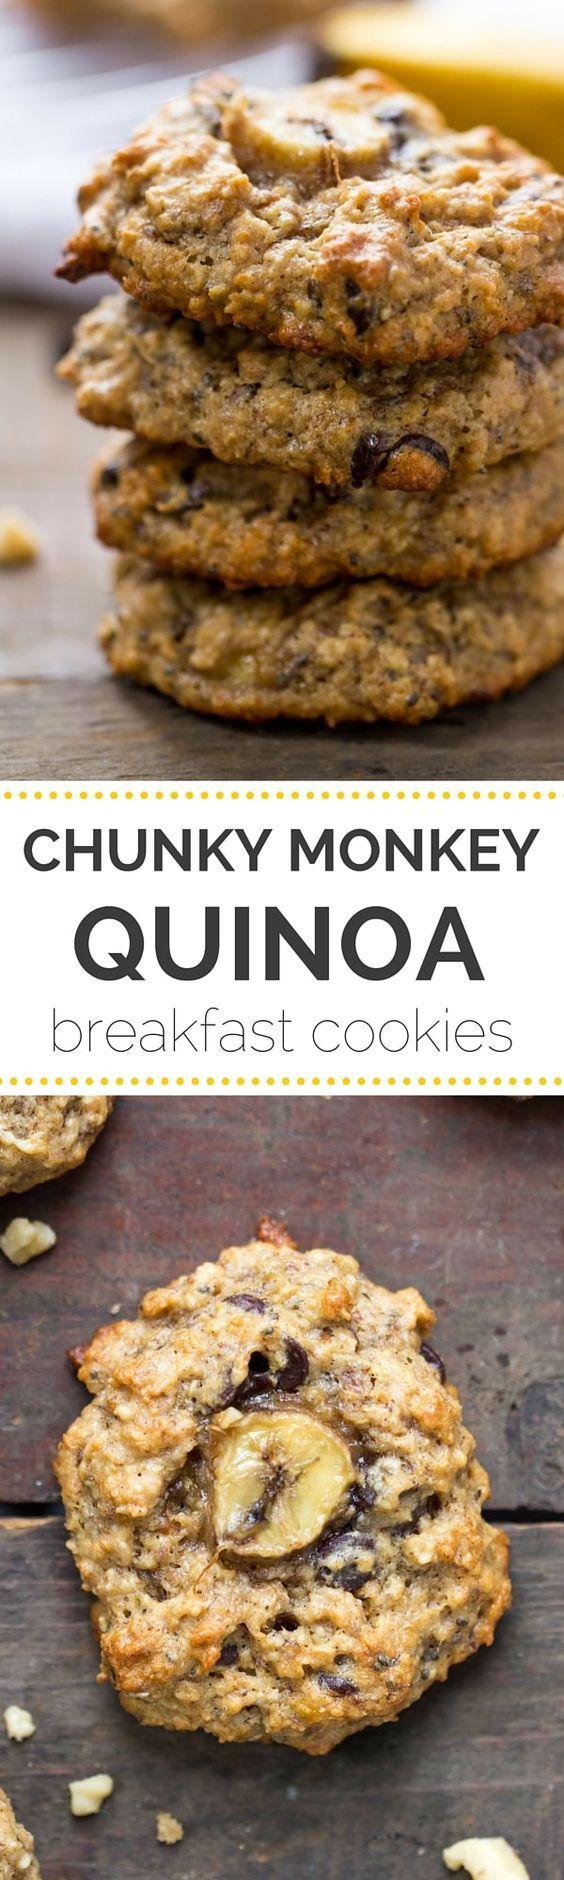 Chunky Monkey Quinoa Breakfast Cookies